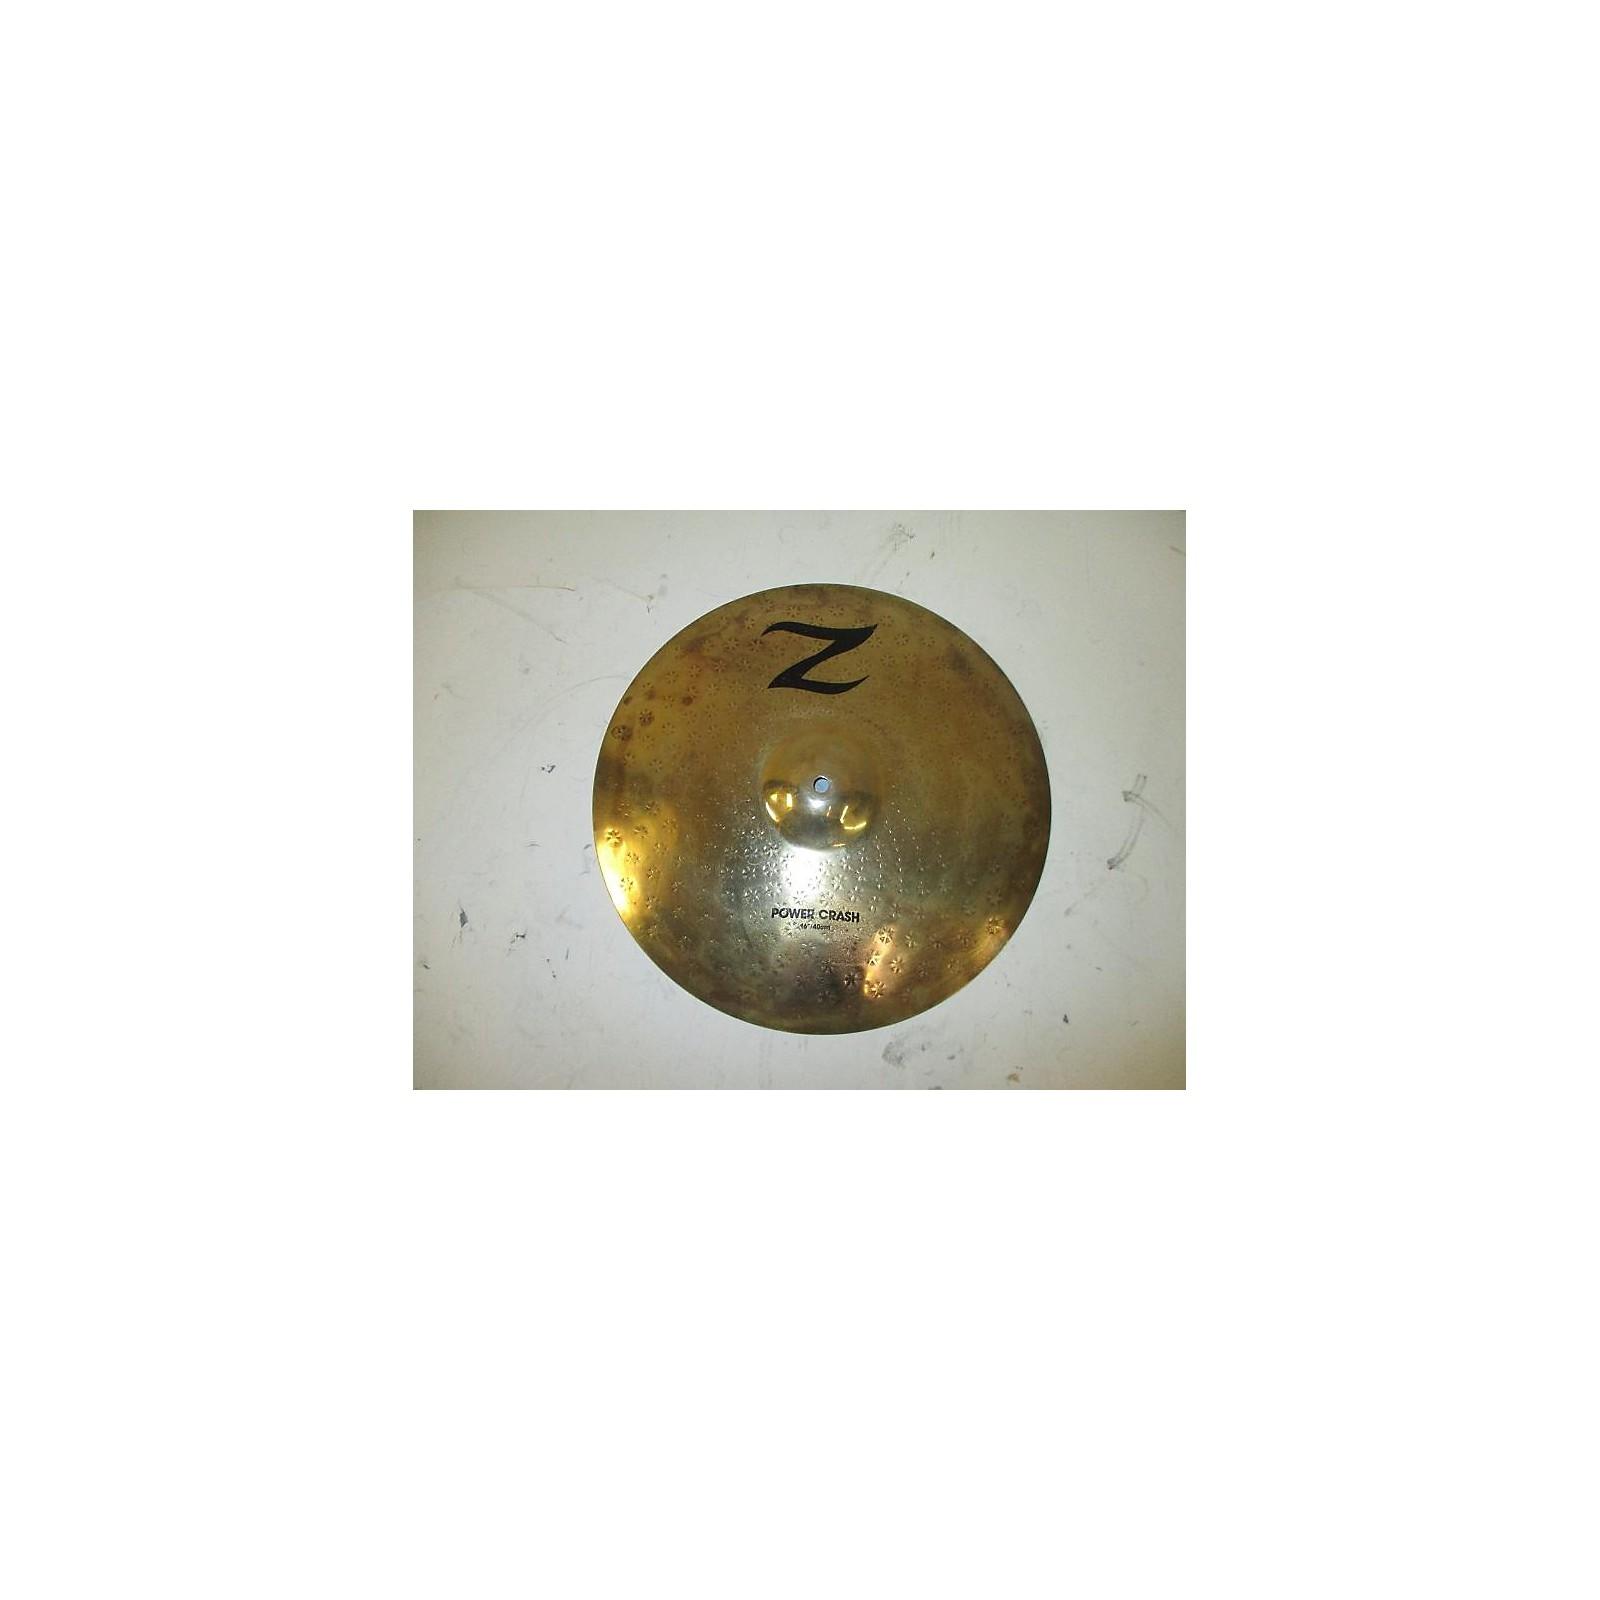 Zildjian 16in Z POWER CRASH Cymbal